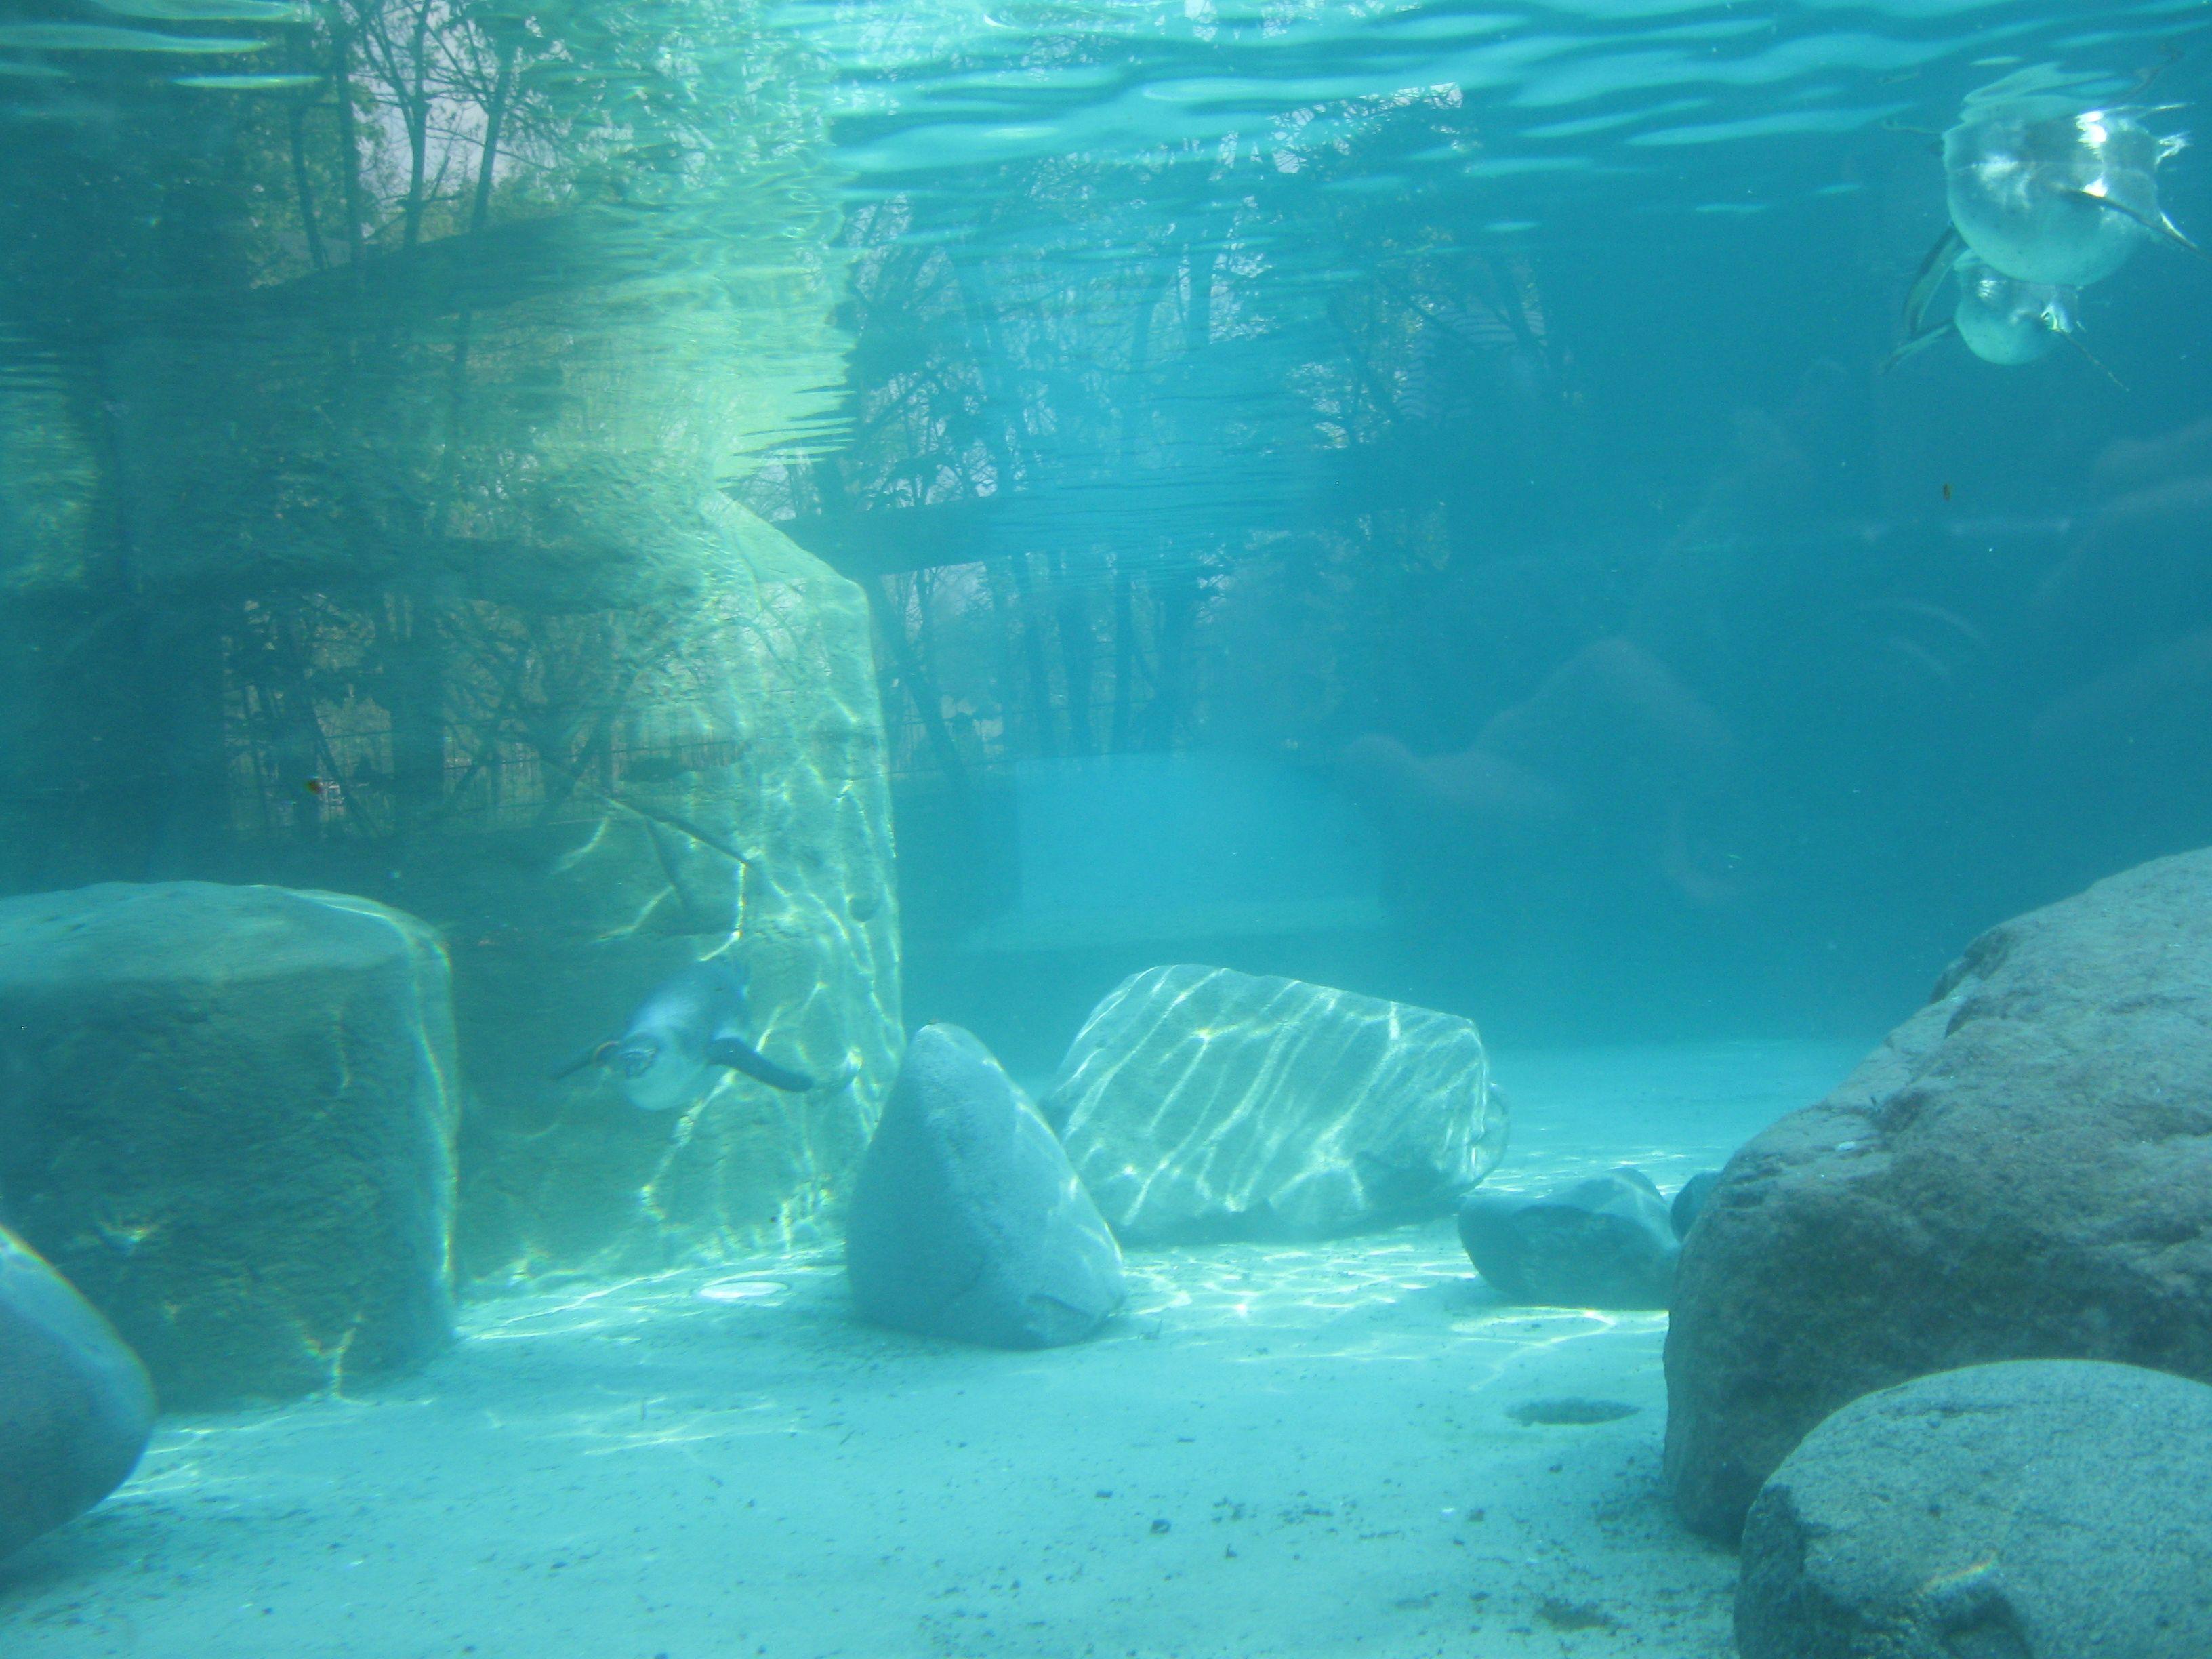 Pinguins under water